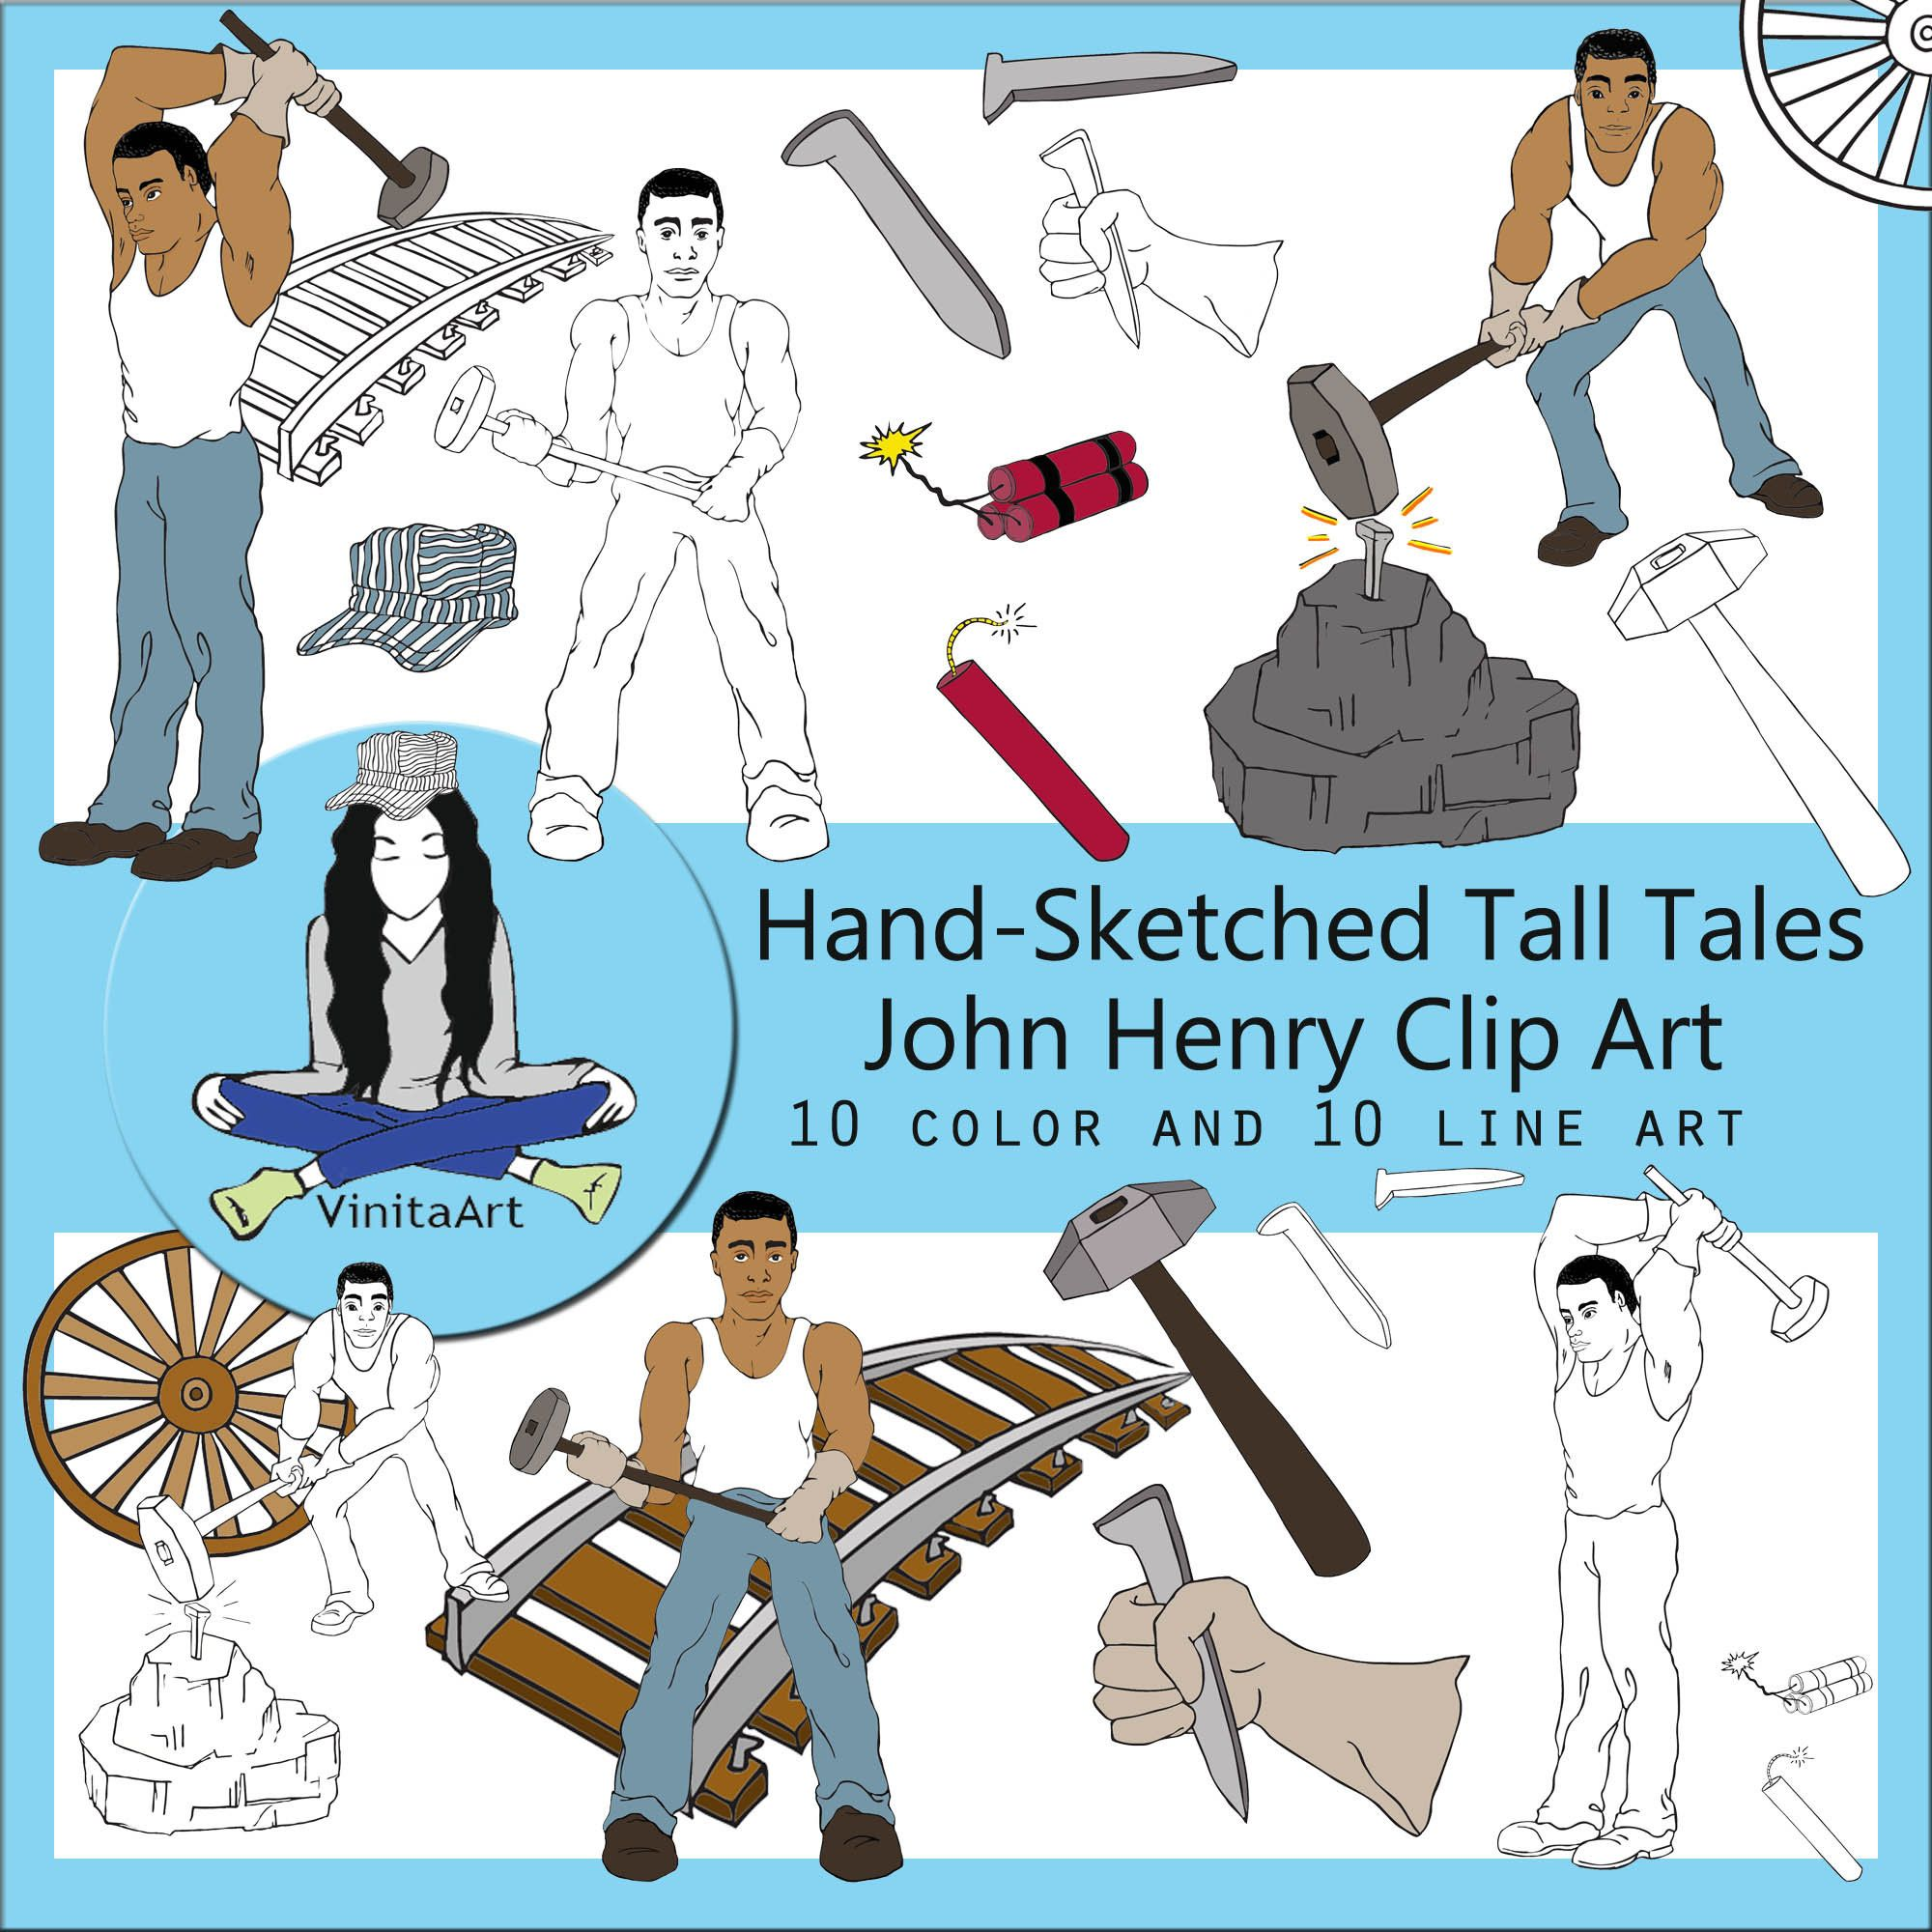 John Henry Clip Art Downloadable Tall Tales Home School